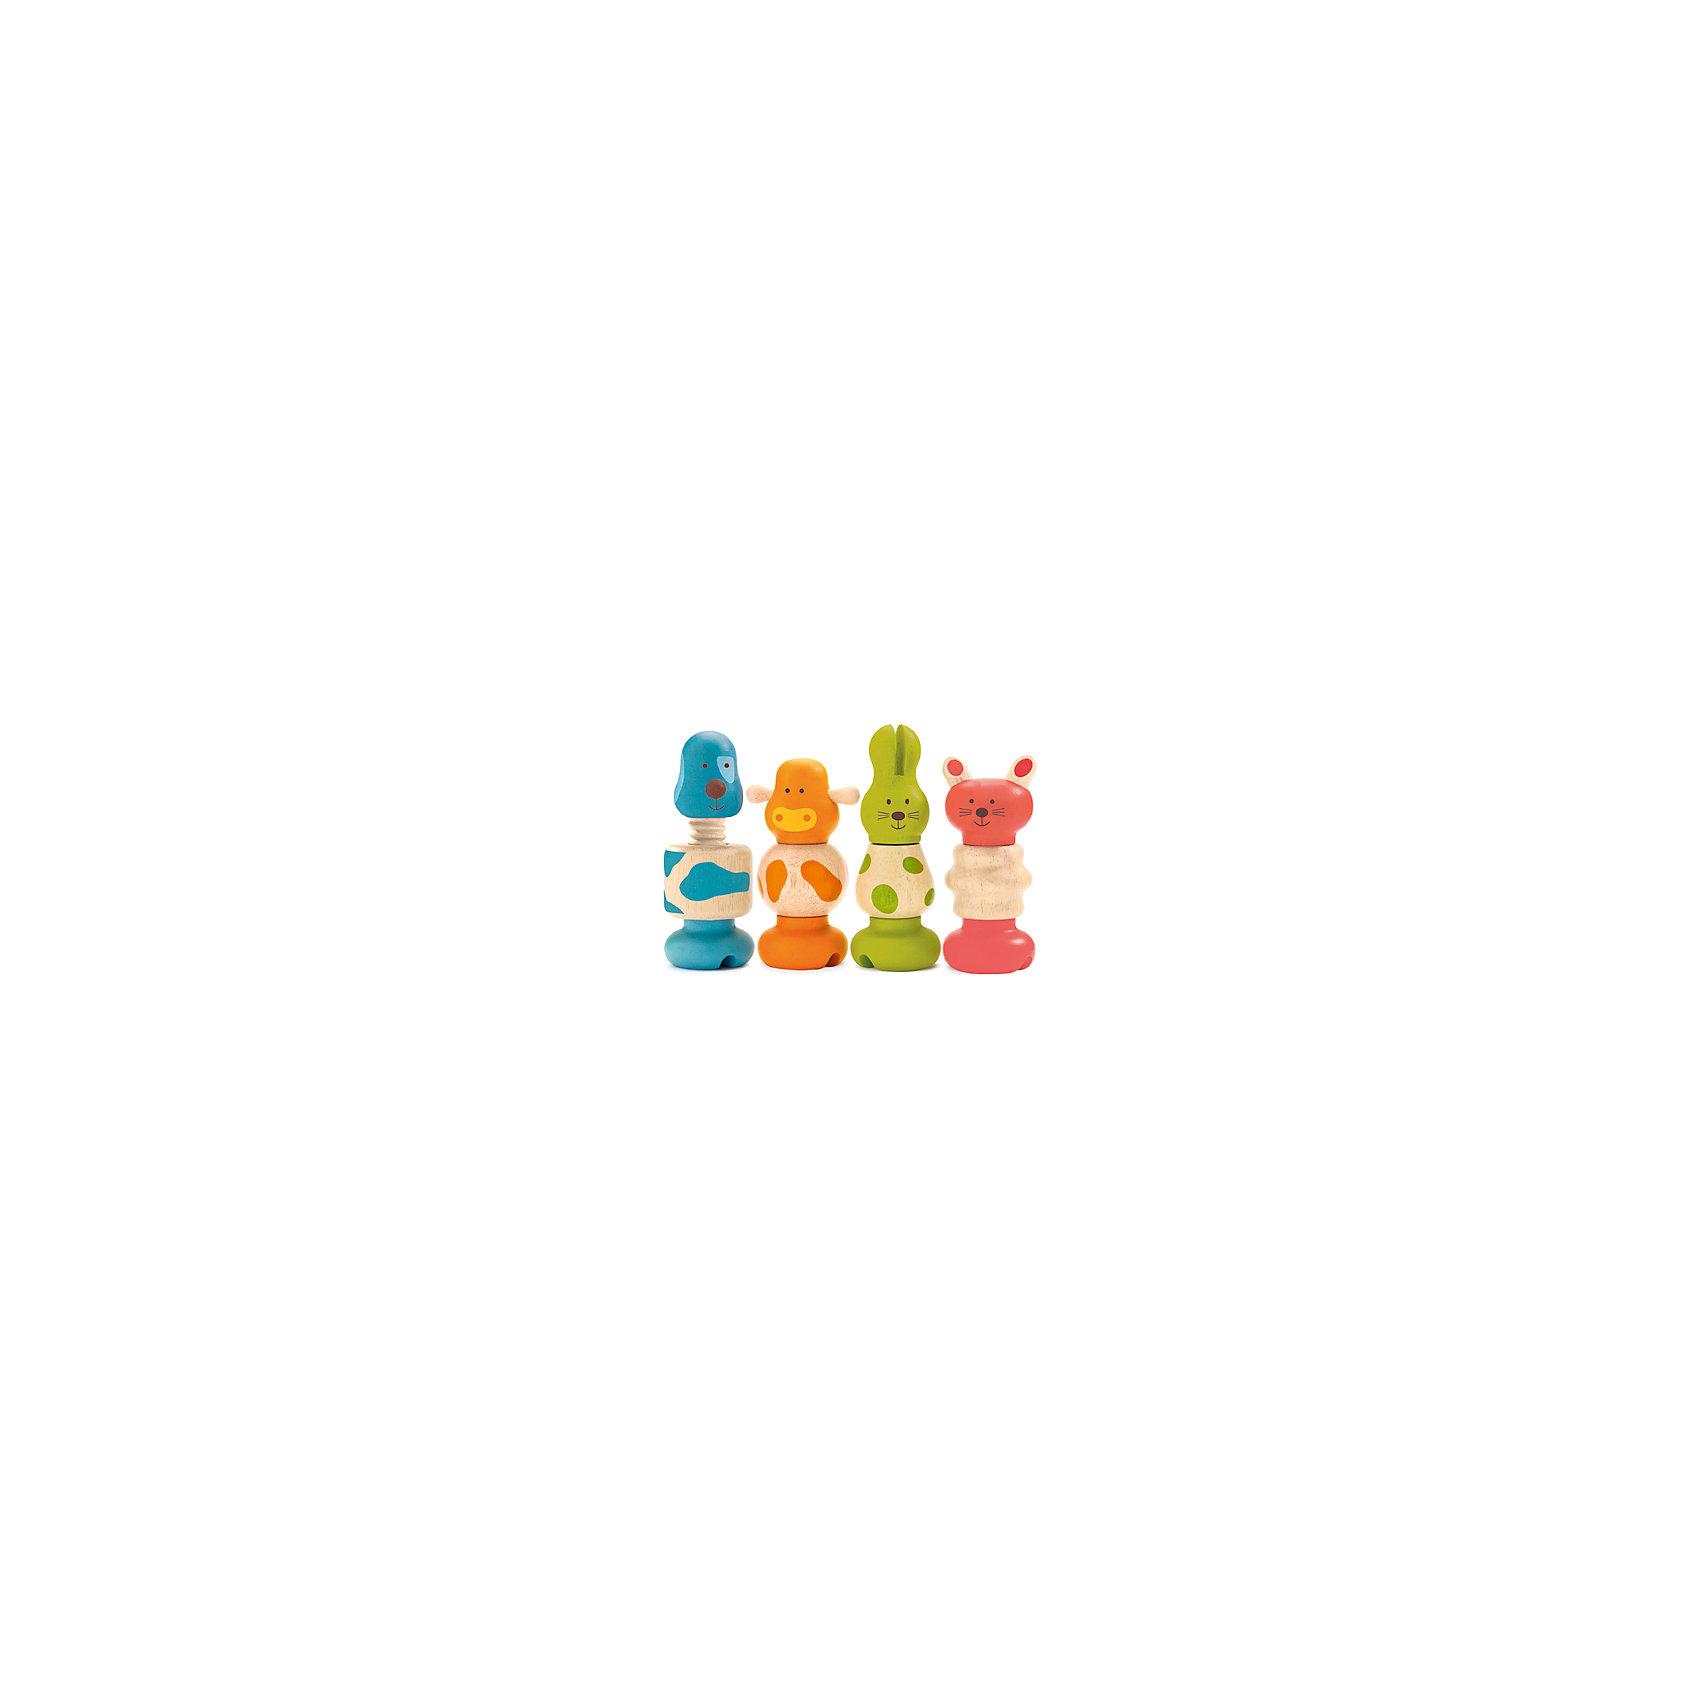 DJECO Набор игрушек Животные, DJECO djeco набор трафаретов животные фермы